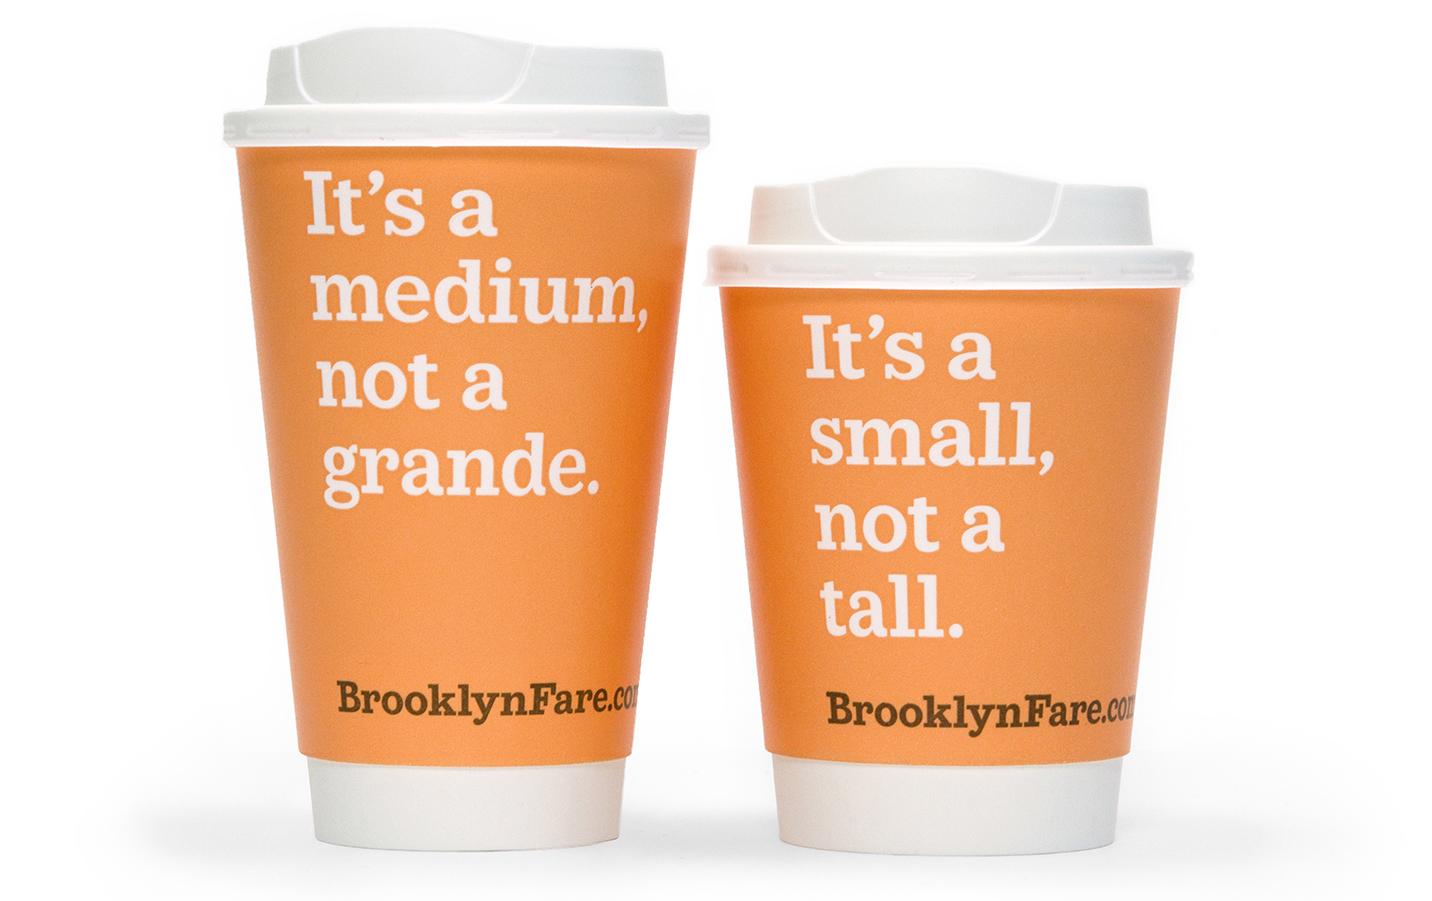 brooklyn fare coffee cups